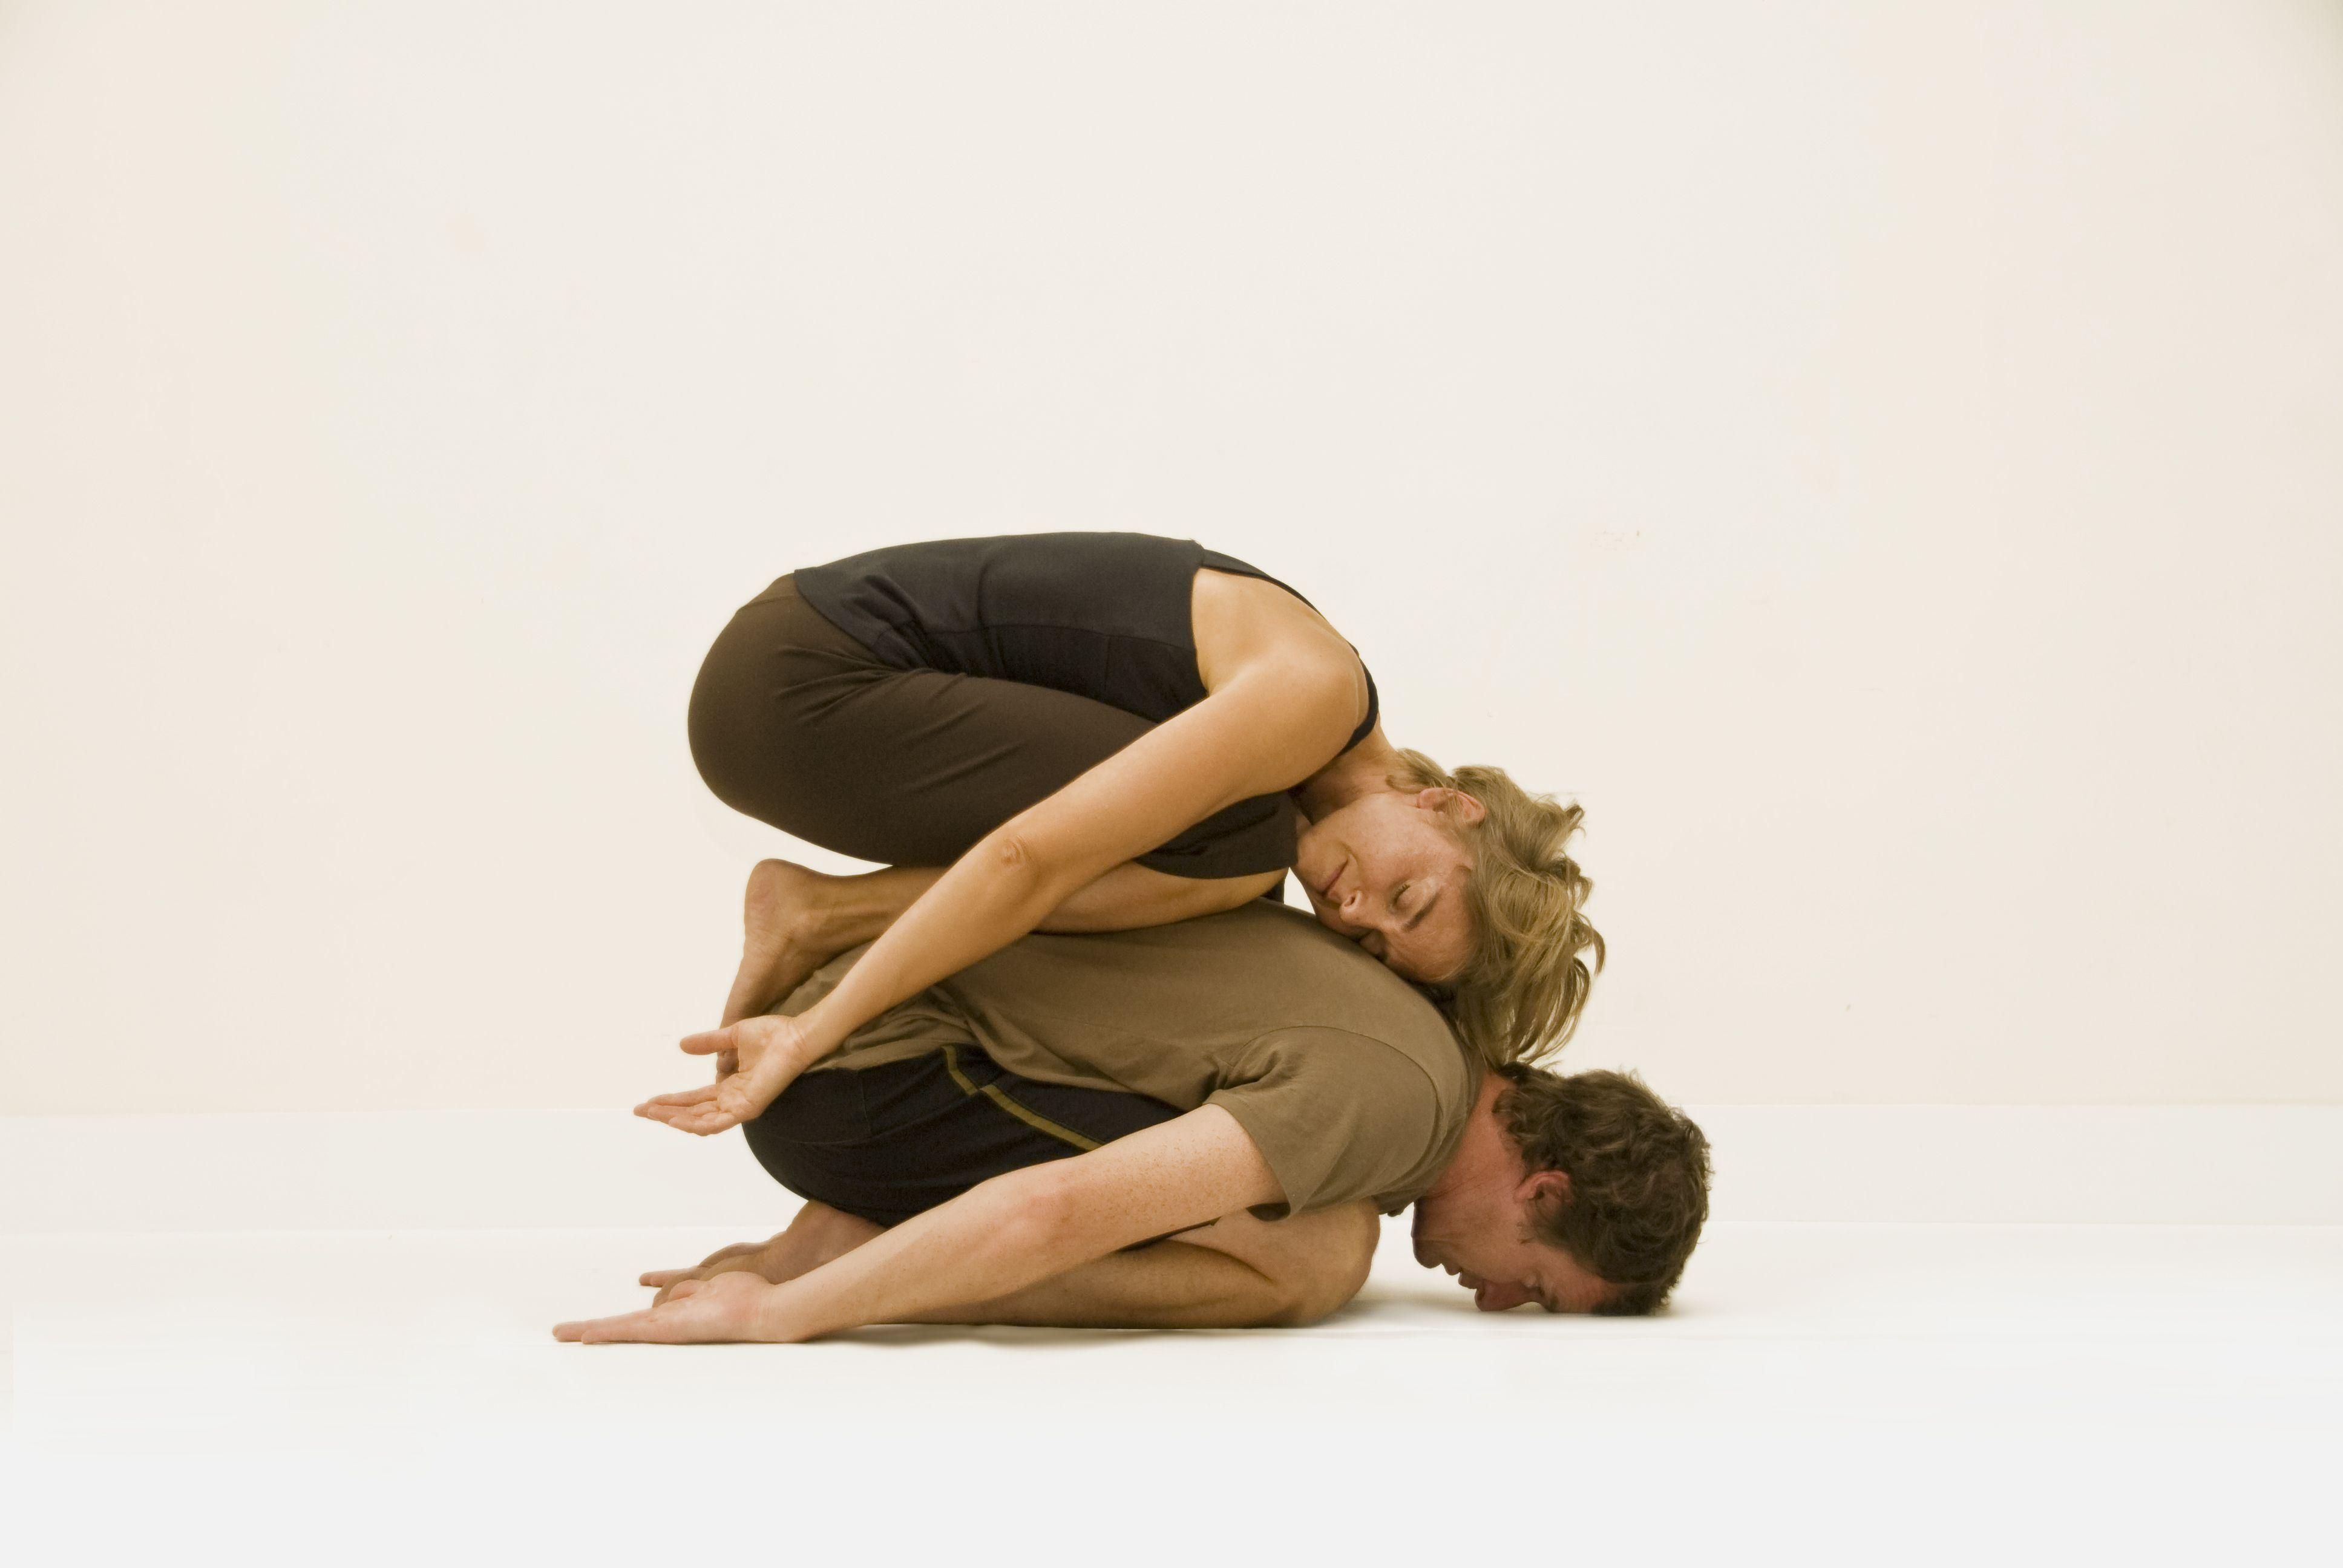 Partner Yoga Poses Images